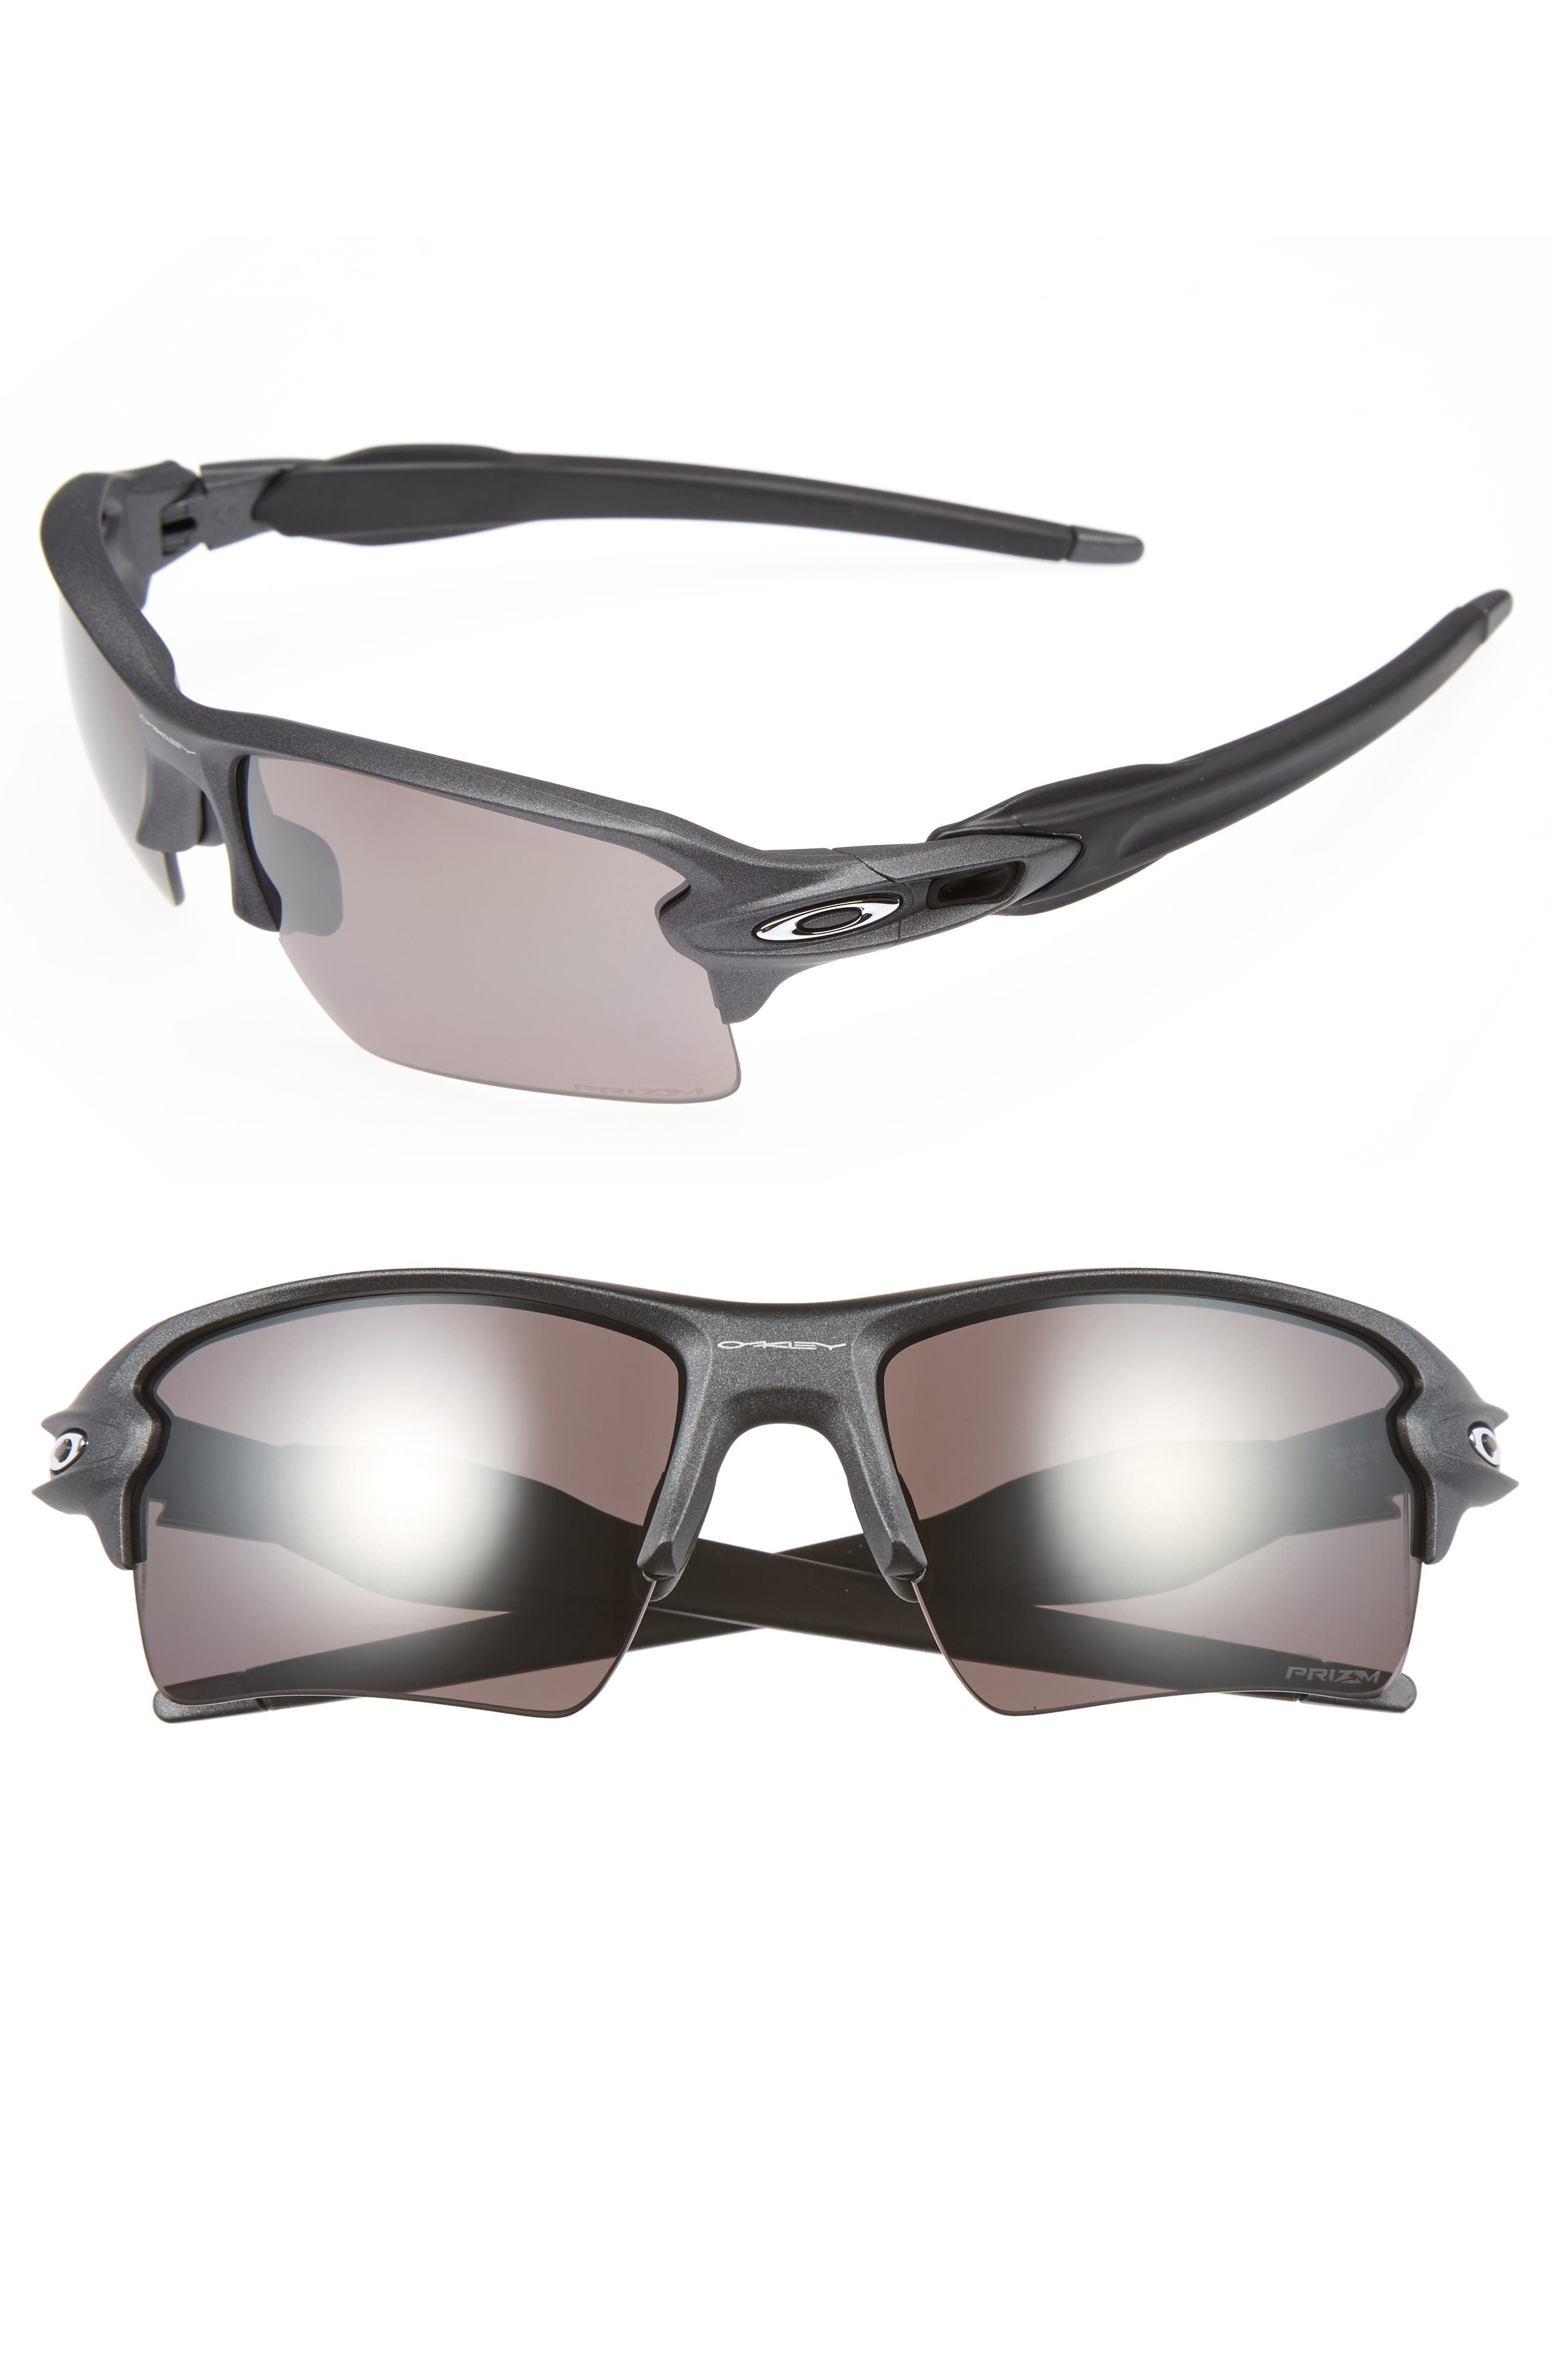 Flak 2.0 XL 59mm Polarized Sunglasses,                         Main,                         color, Grey